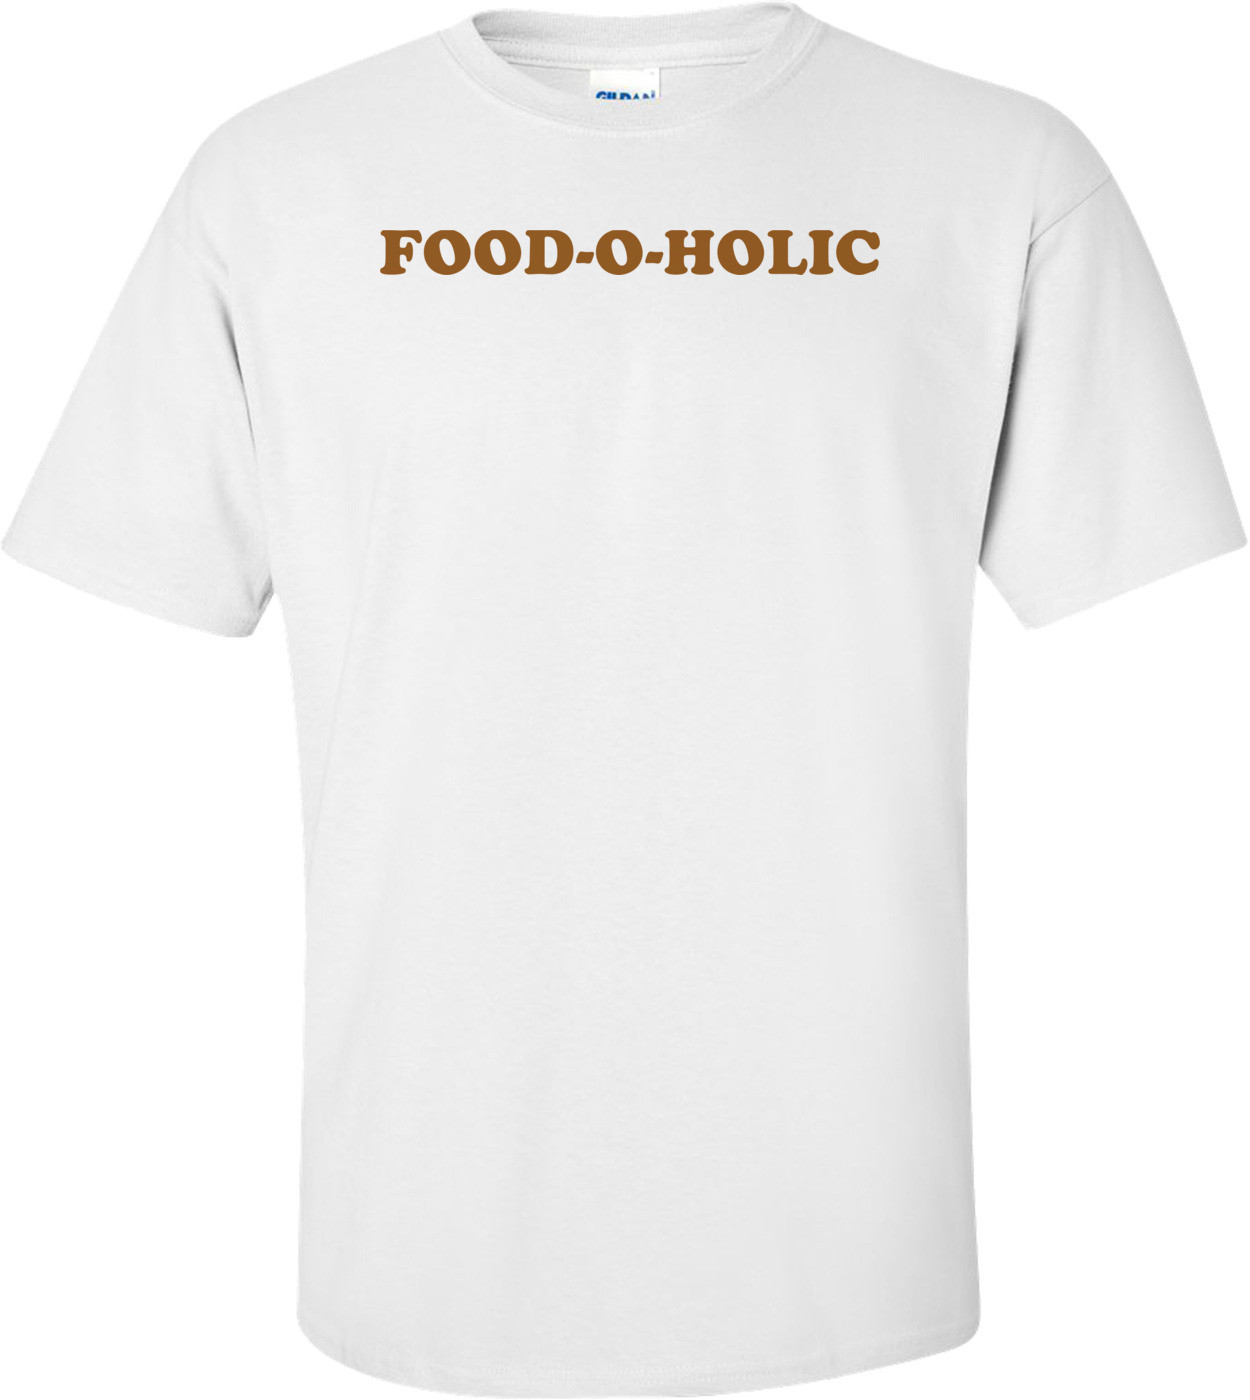 FOOD-O-HOLIC Shirt